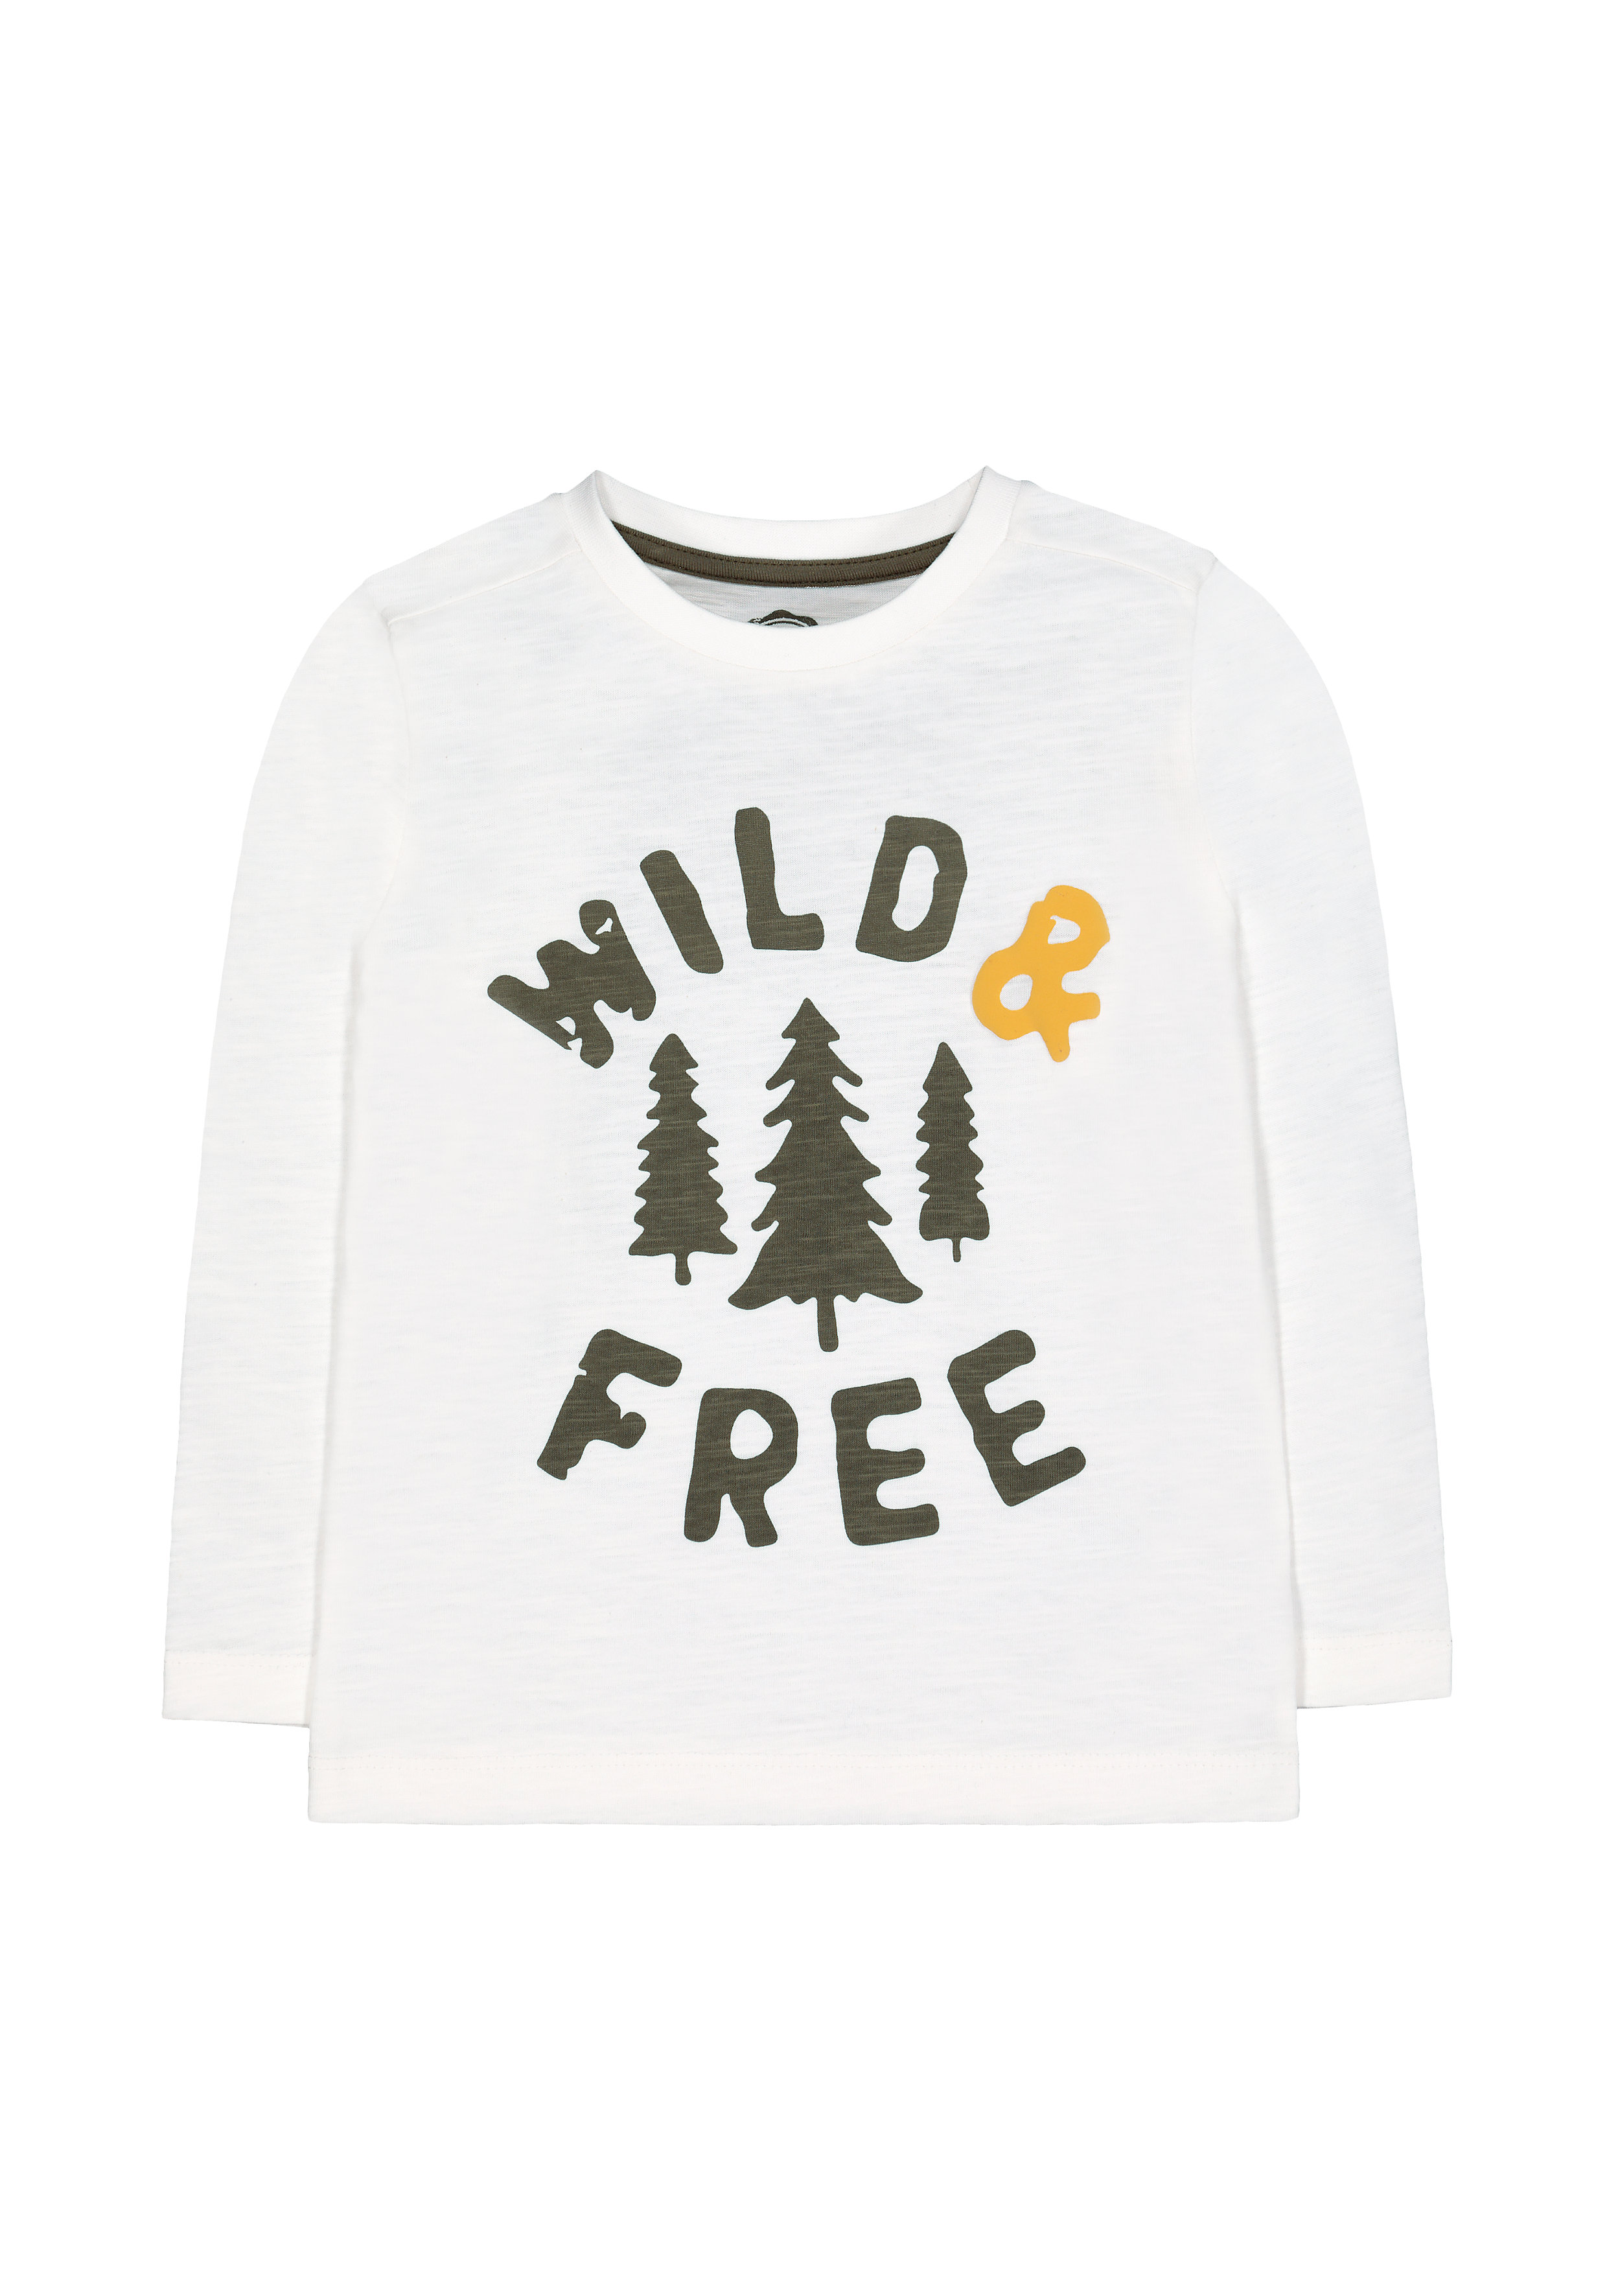 Mothercare | Boys Full Sleeves T-Shirt Slogan Print - White